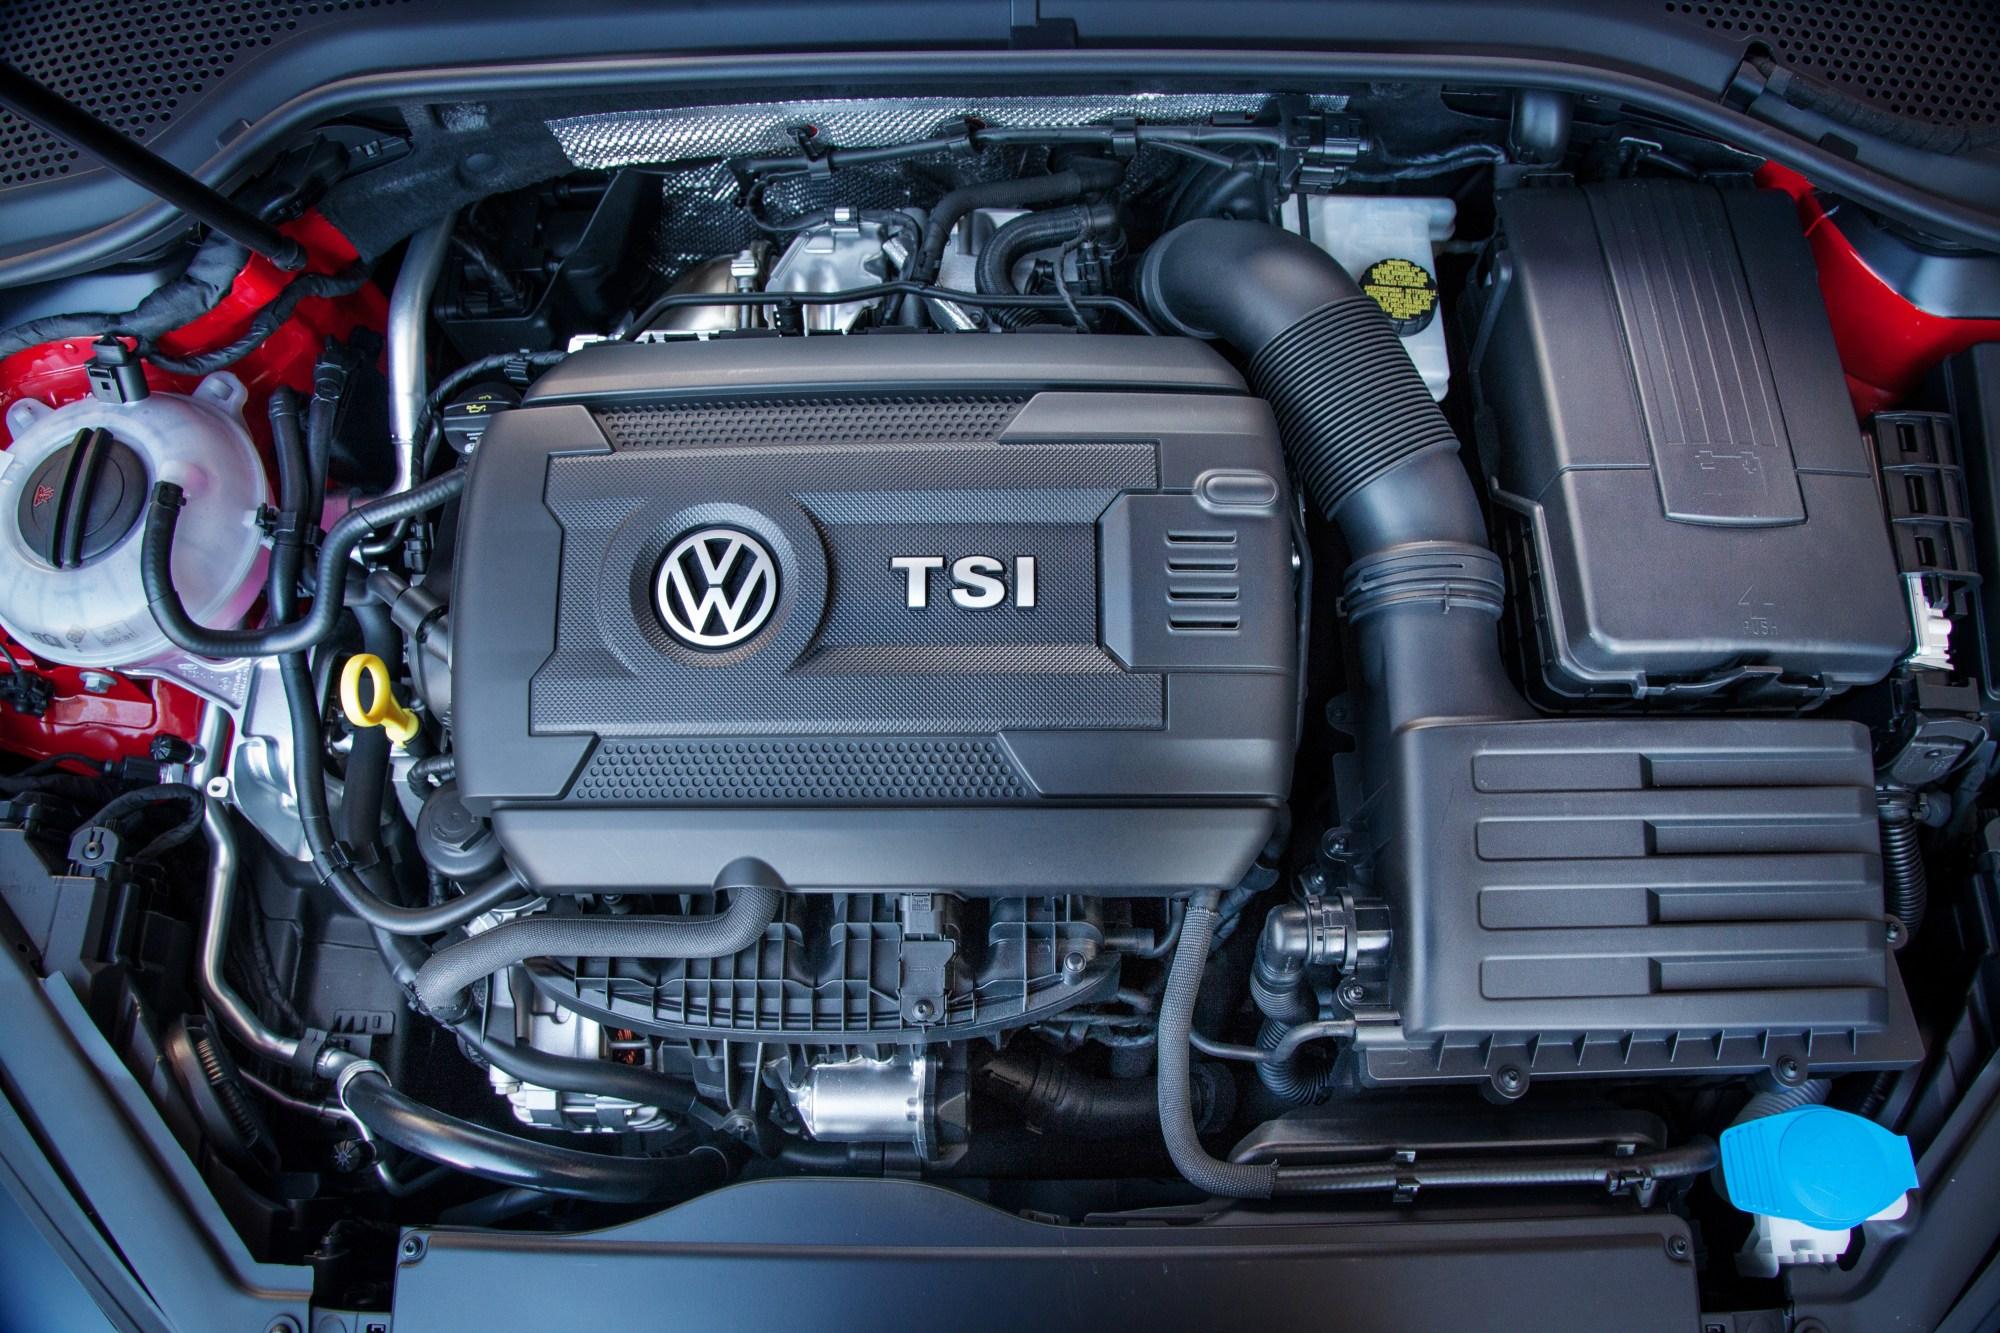 hight resolution of volkswagen s turbocharged 1 8 liter engine named to 2015 ward s 10 2015 volkswagen jetta engine diagram 2015 volkswagen engine diagrams